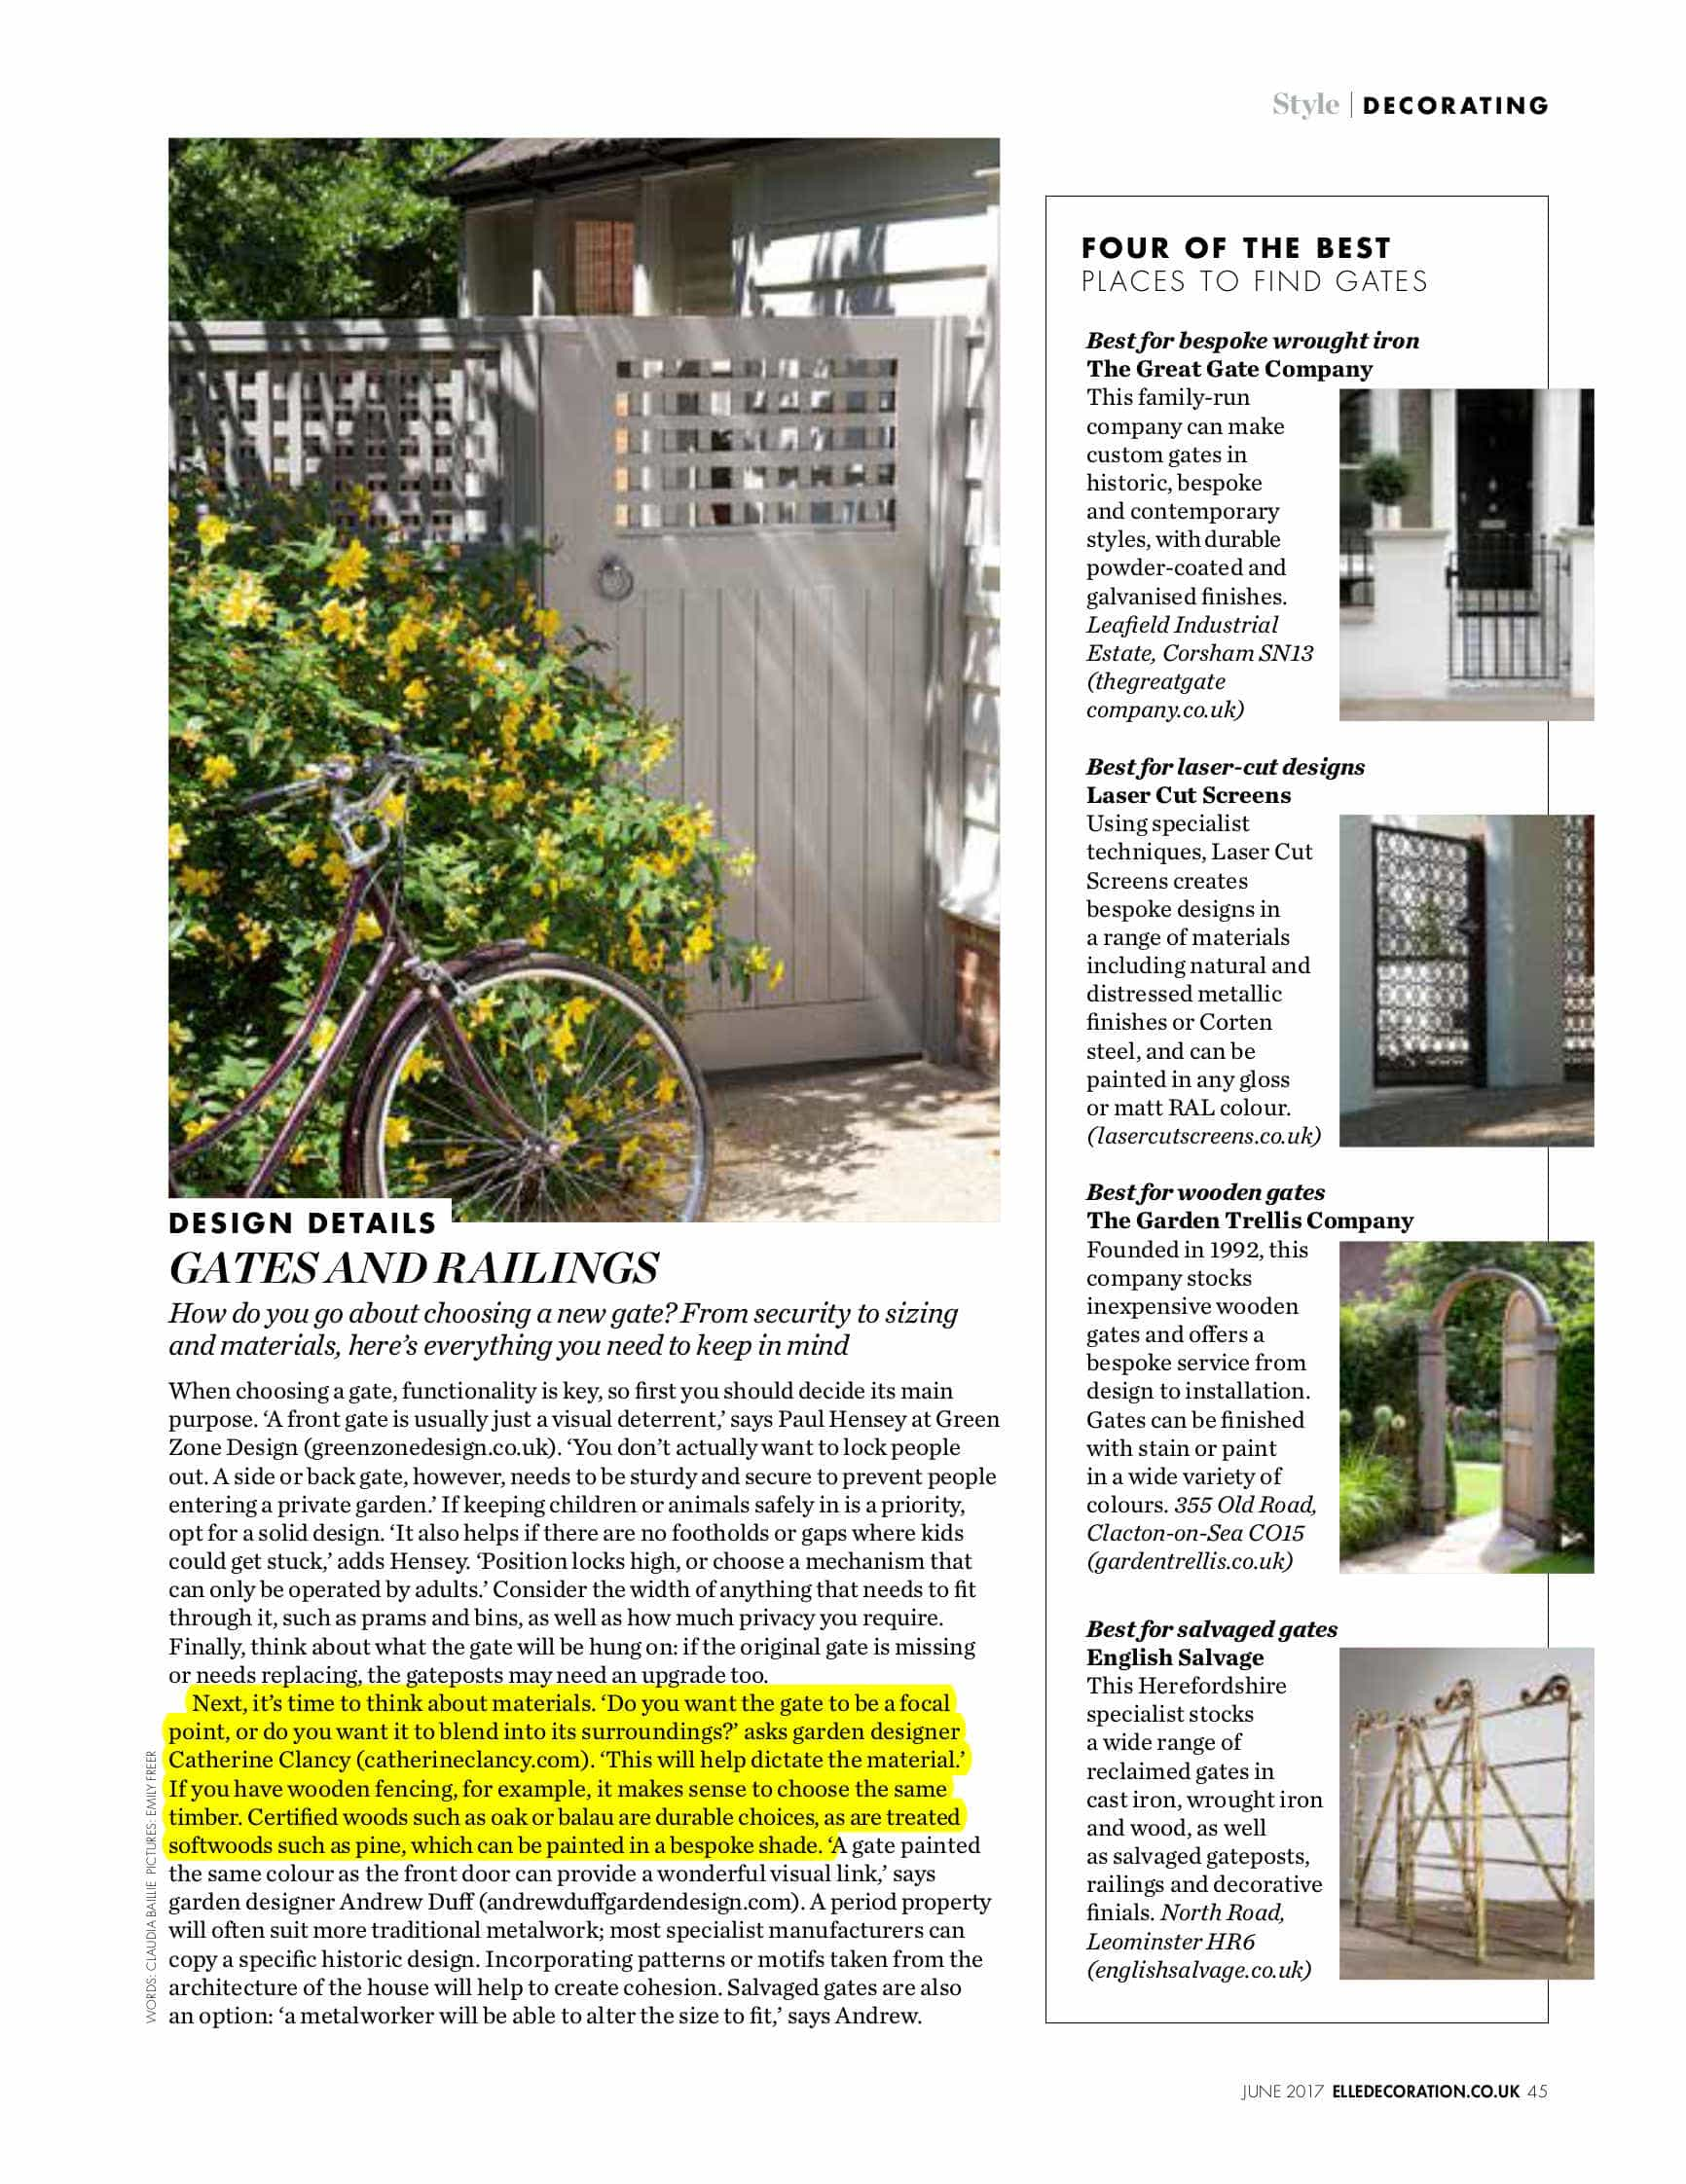 elle decor- garden gates - garden design london - catherine clancy